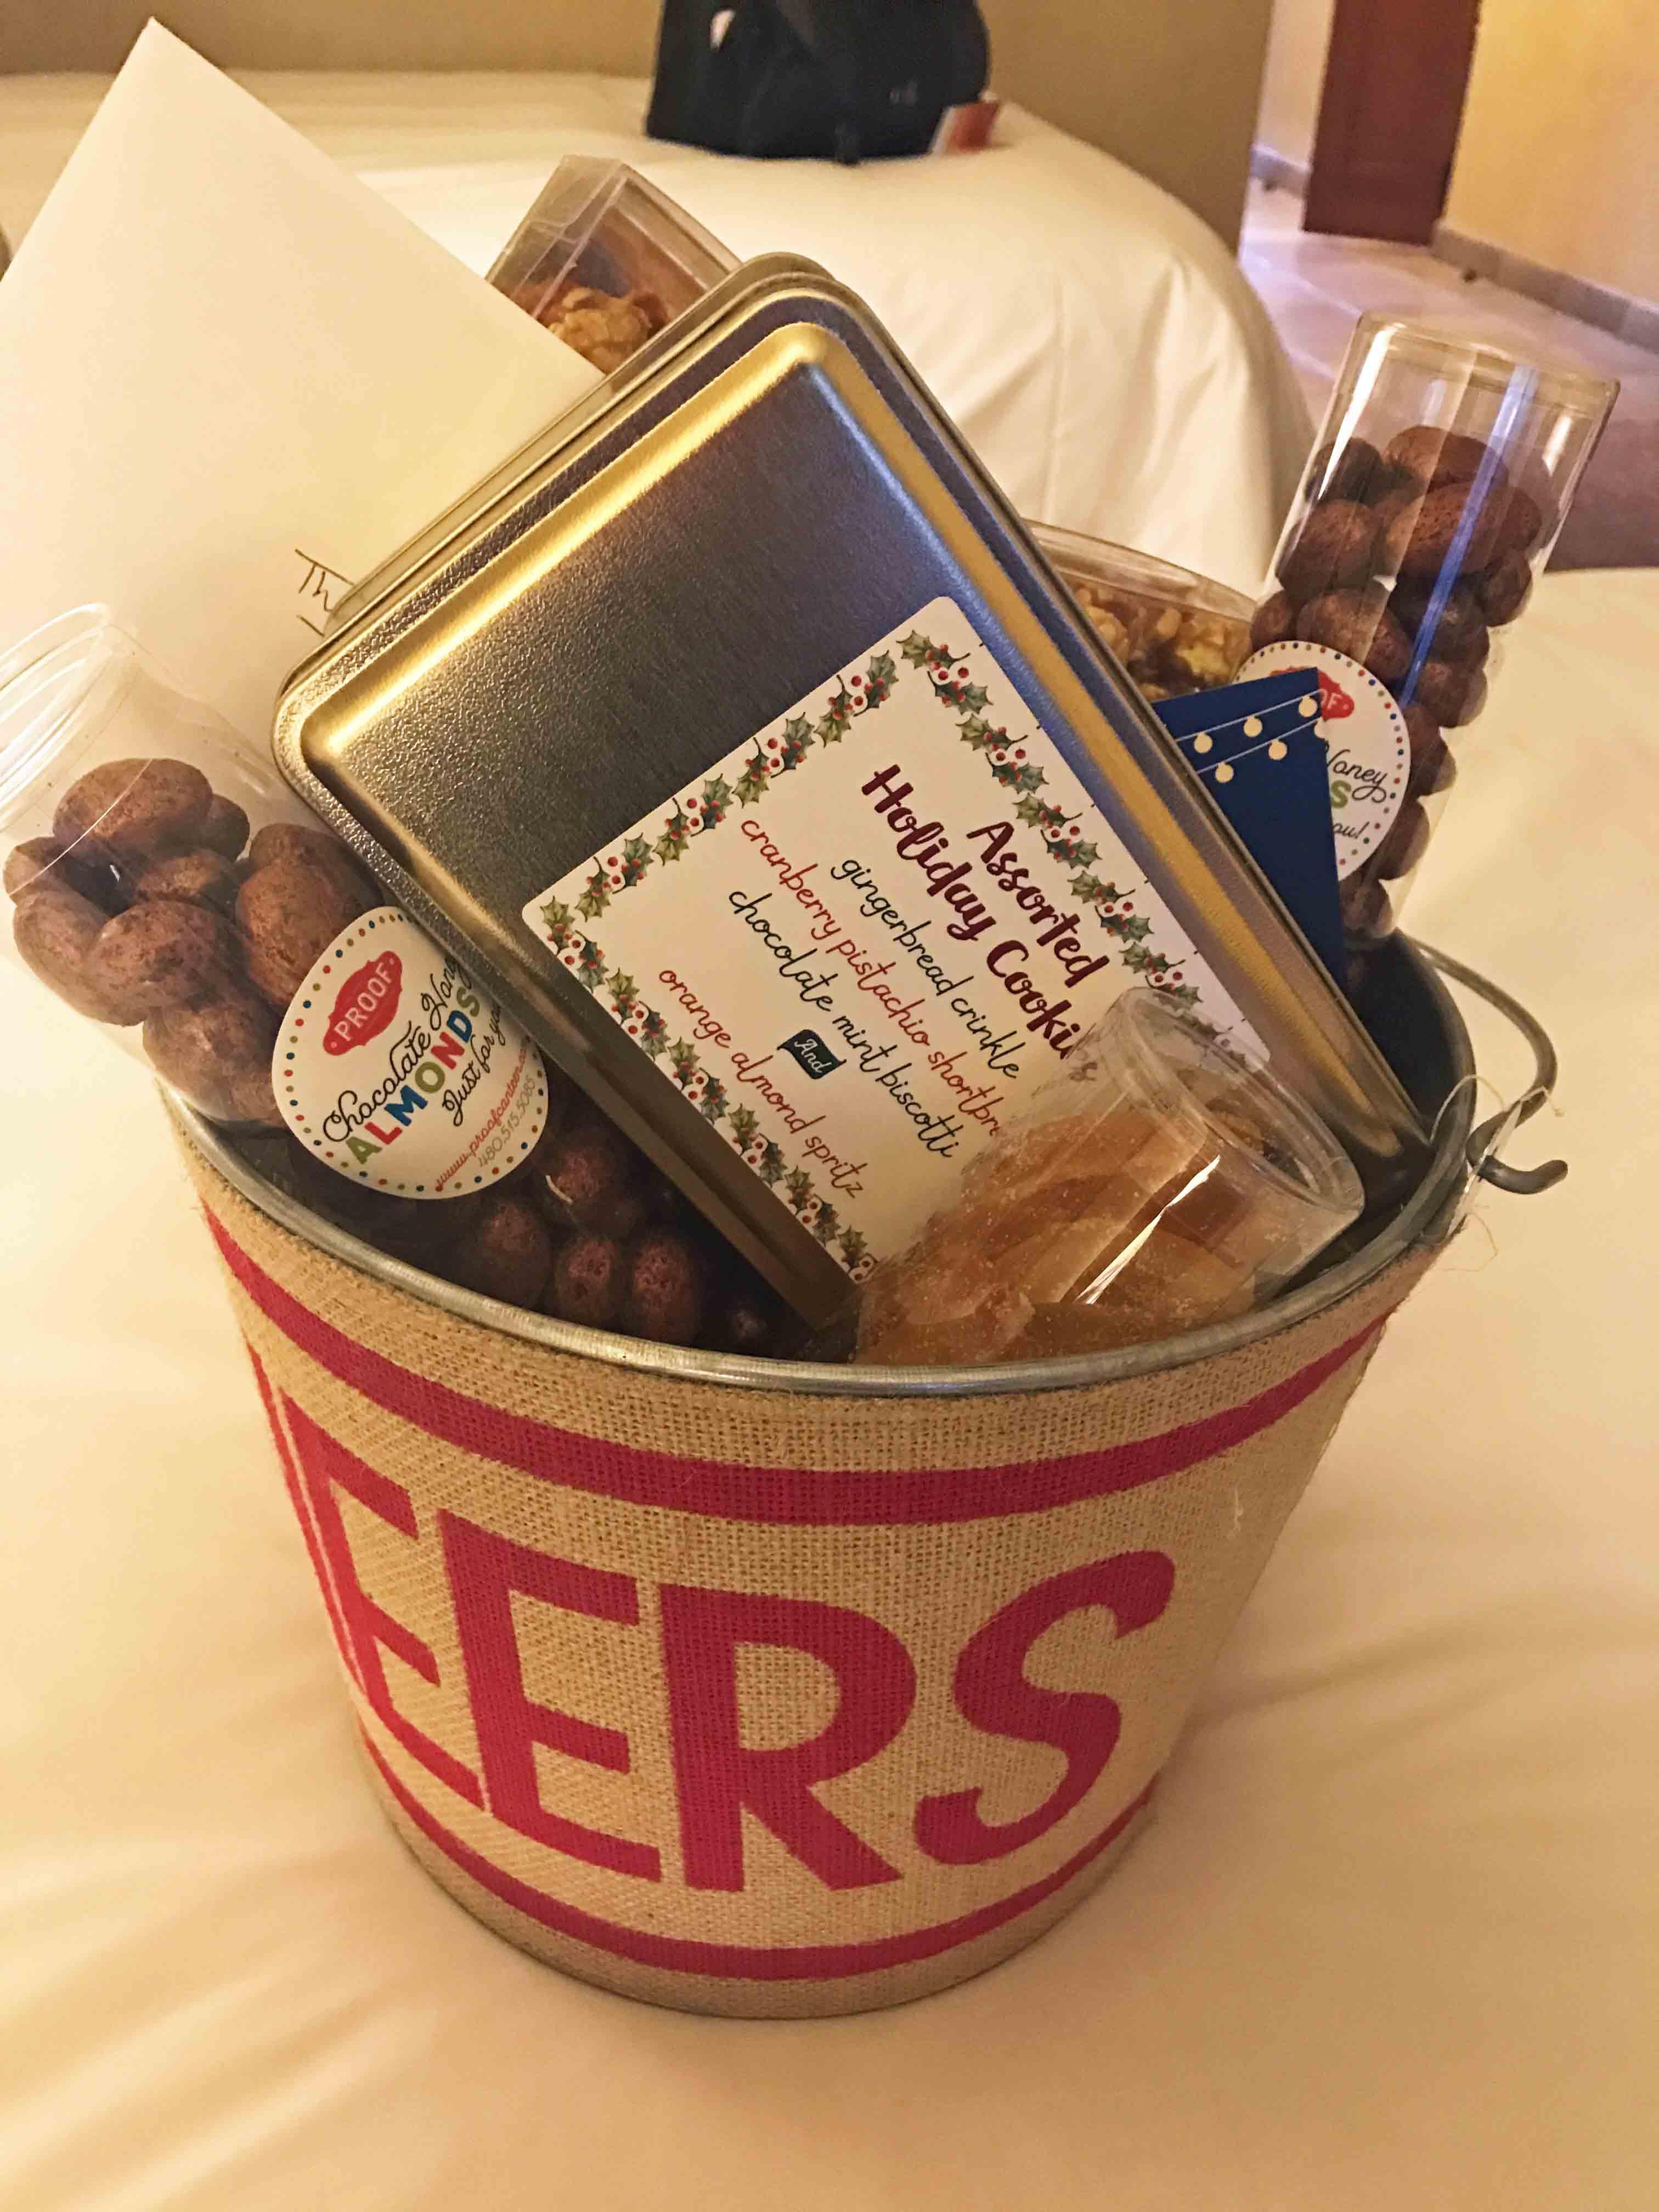 Arizona Four Seasons Christms + Homemade Hot Chocolate. Welcoming basket full of goodies at Four Seasons Scottsdale.